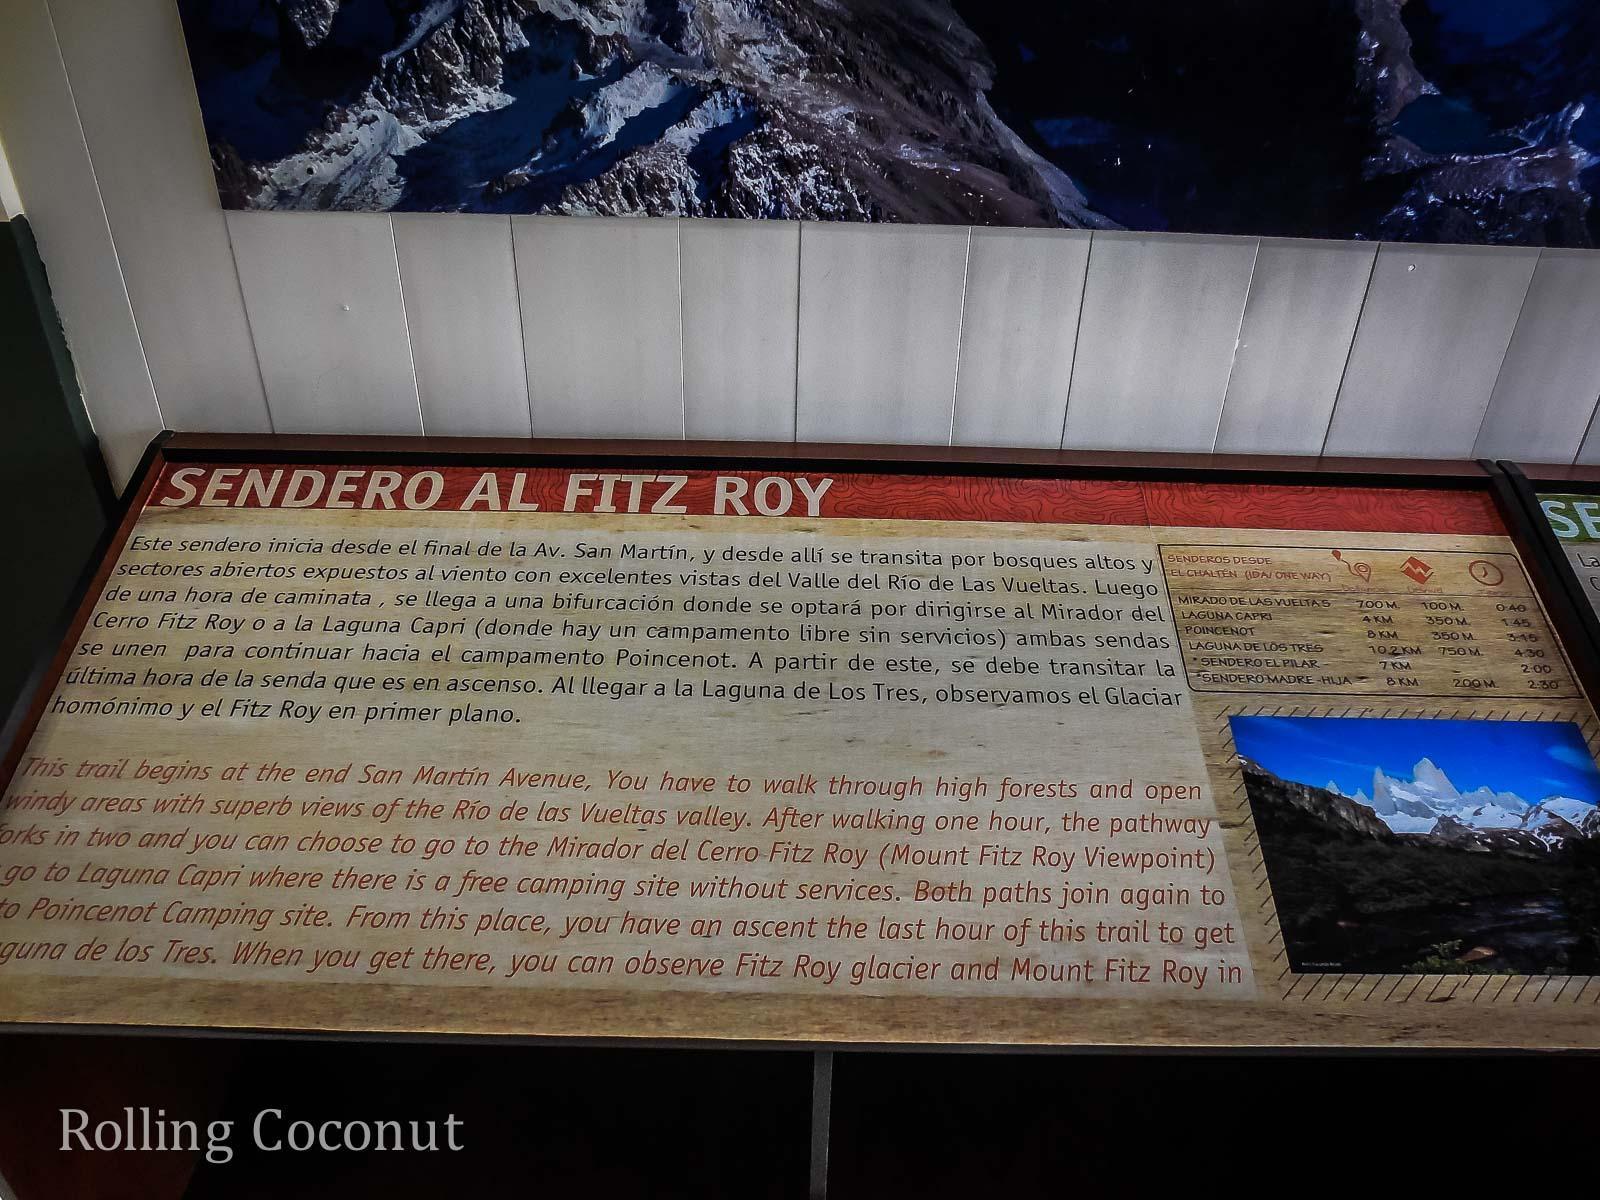 El Chalten Argentina Patagonia Trek Fitz Roy ooaworld Rolling Coconut Photo Ooaworld